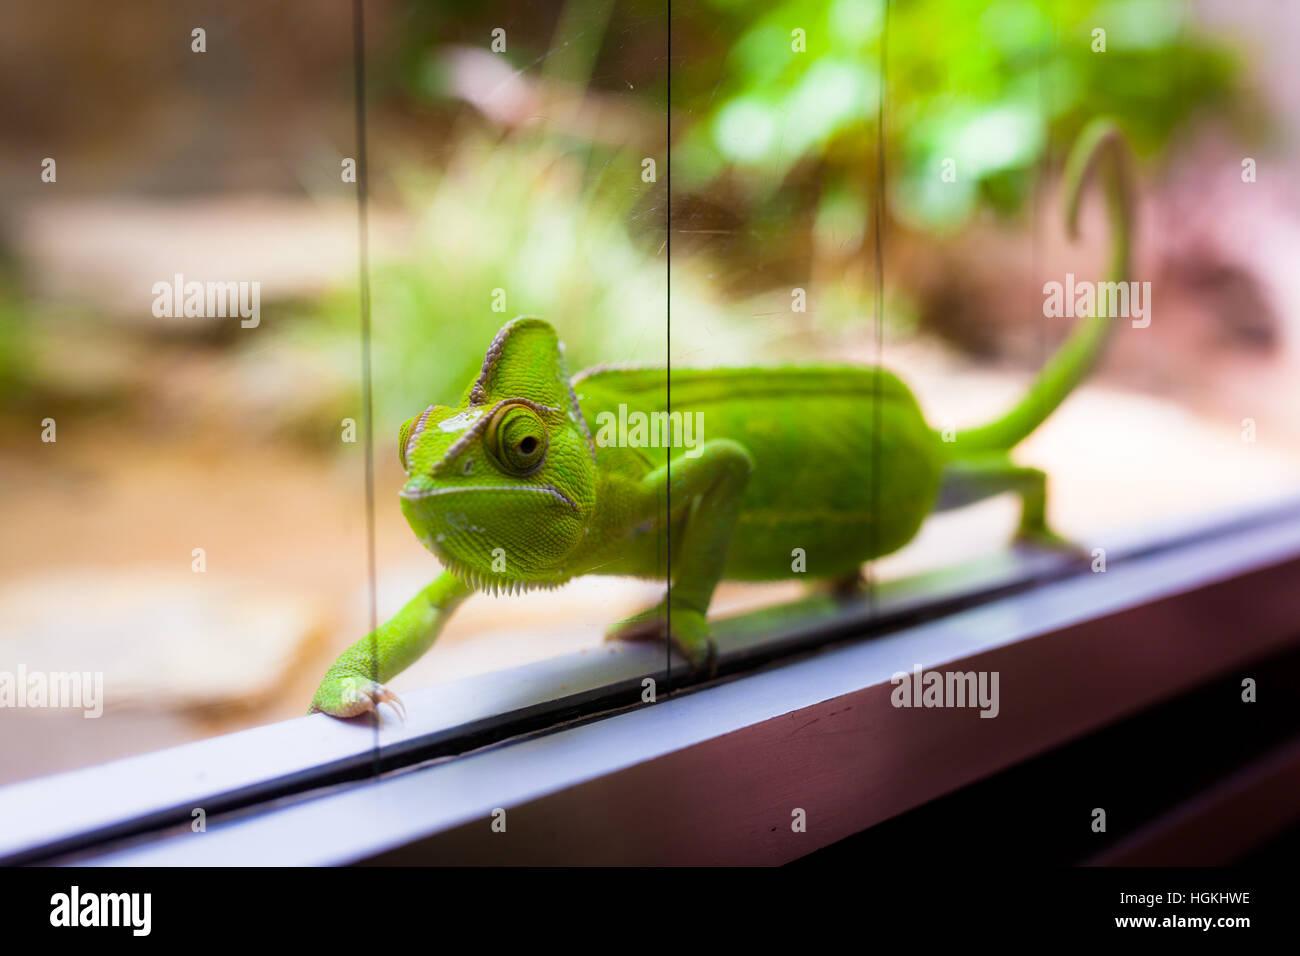 Chameleon In Glass Terrarium Stock Photo 130738202 Alamy